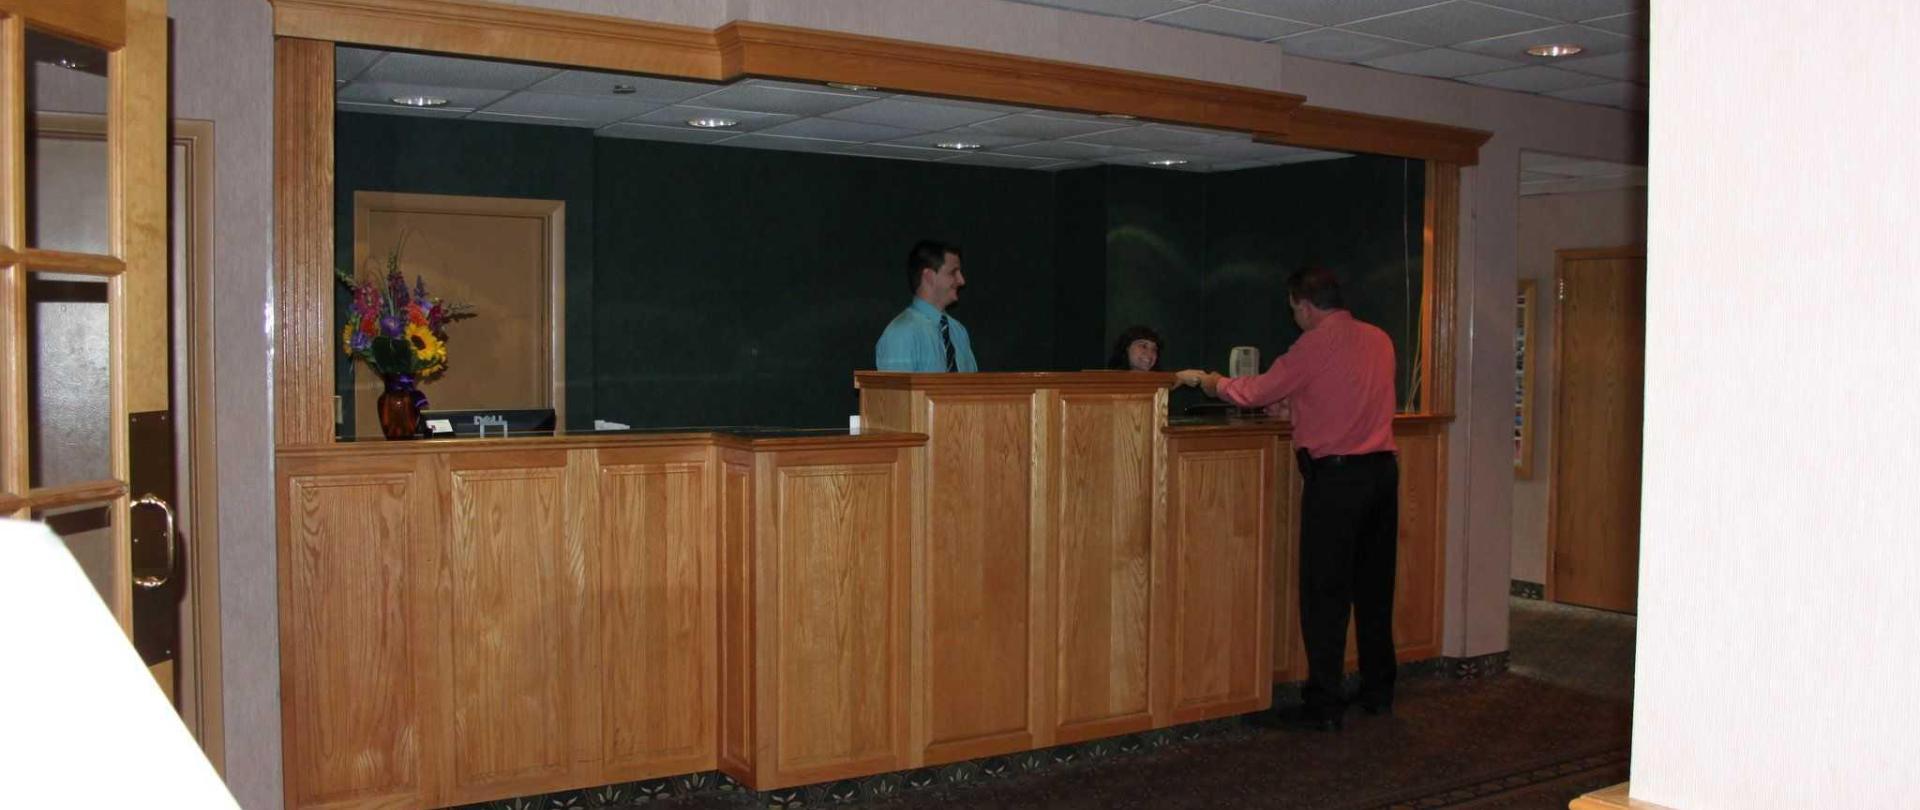 trip-hotel-ithaca-front-desk.JPG